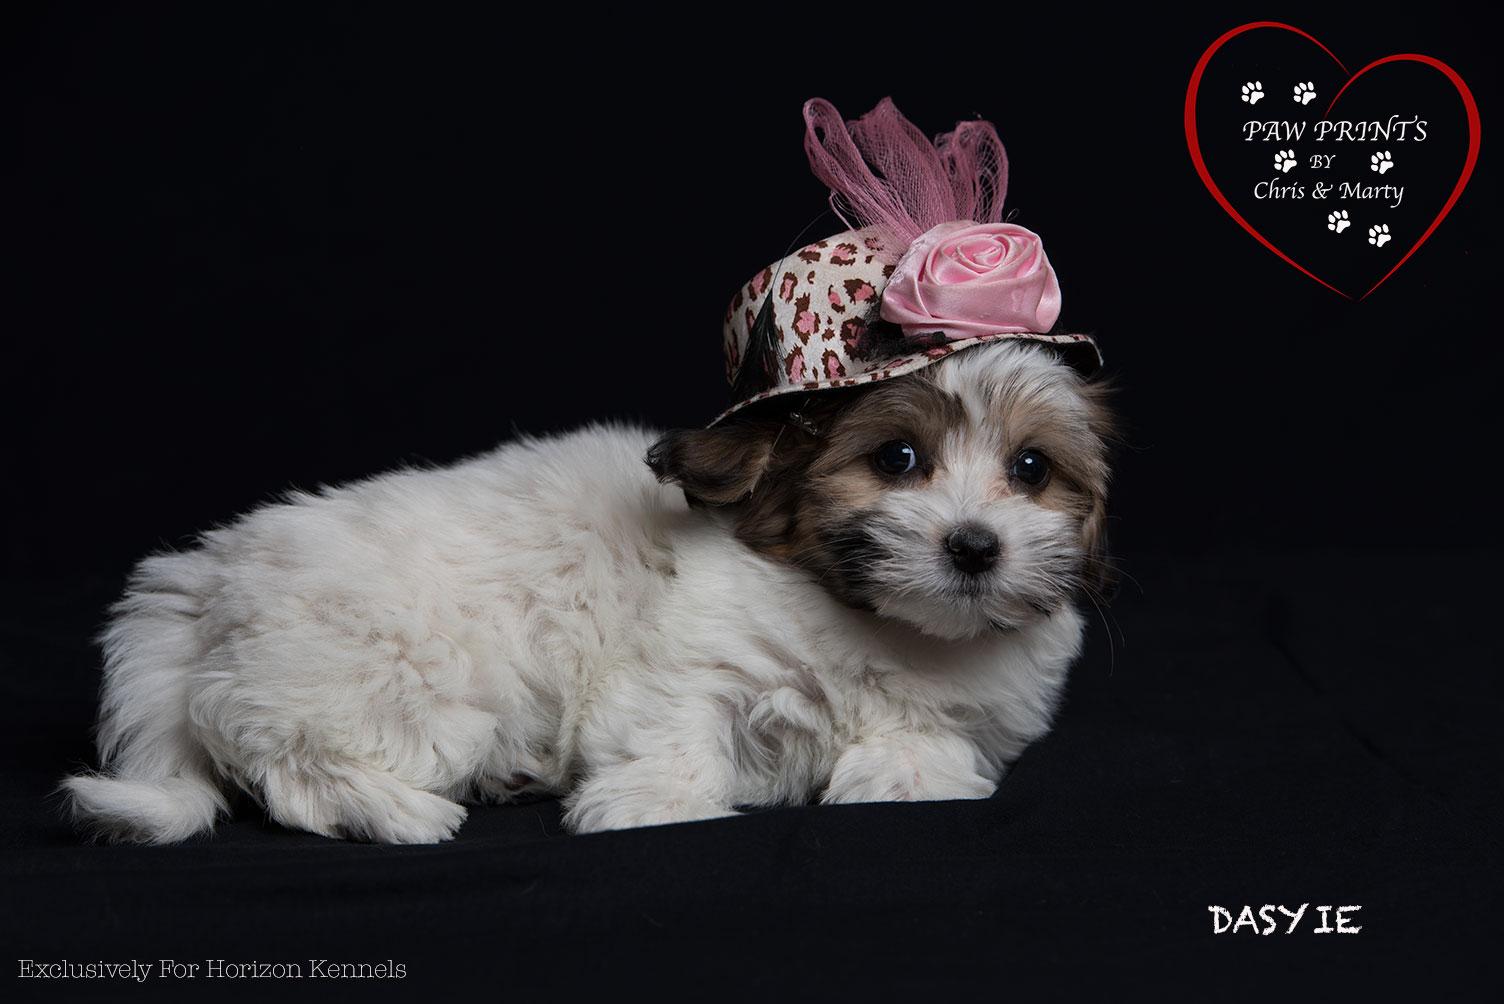 2015-04-12 ms lipps-samson Dasyie female 2